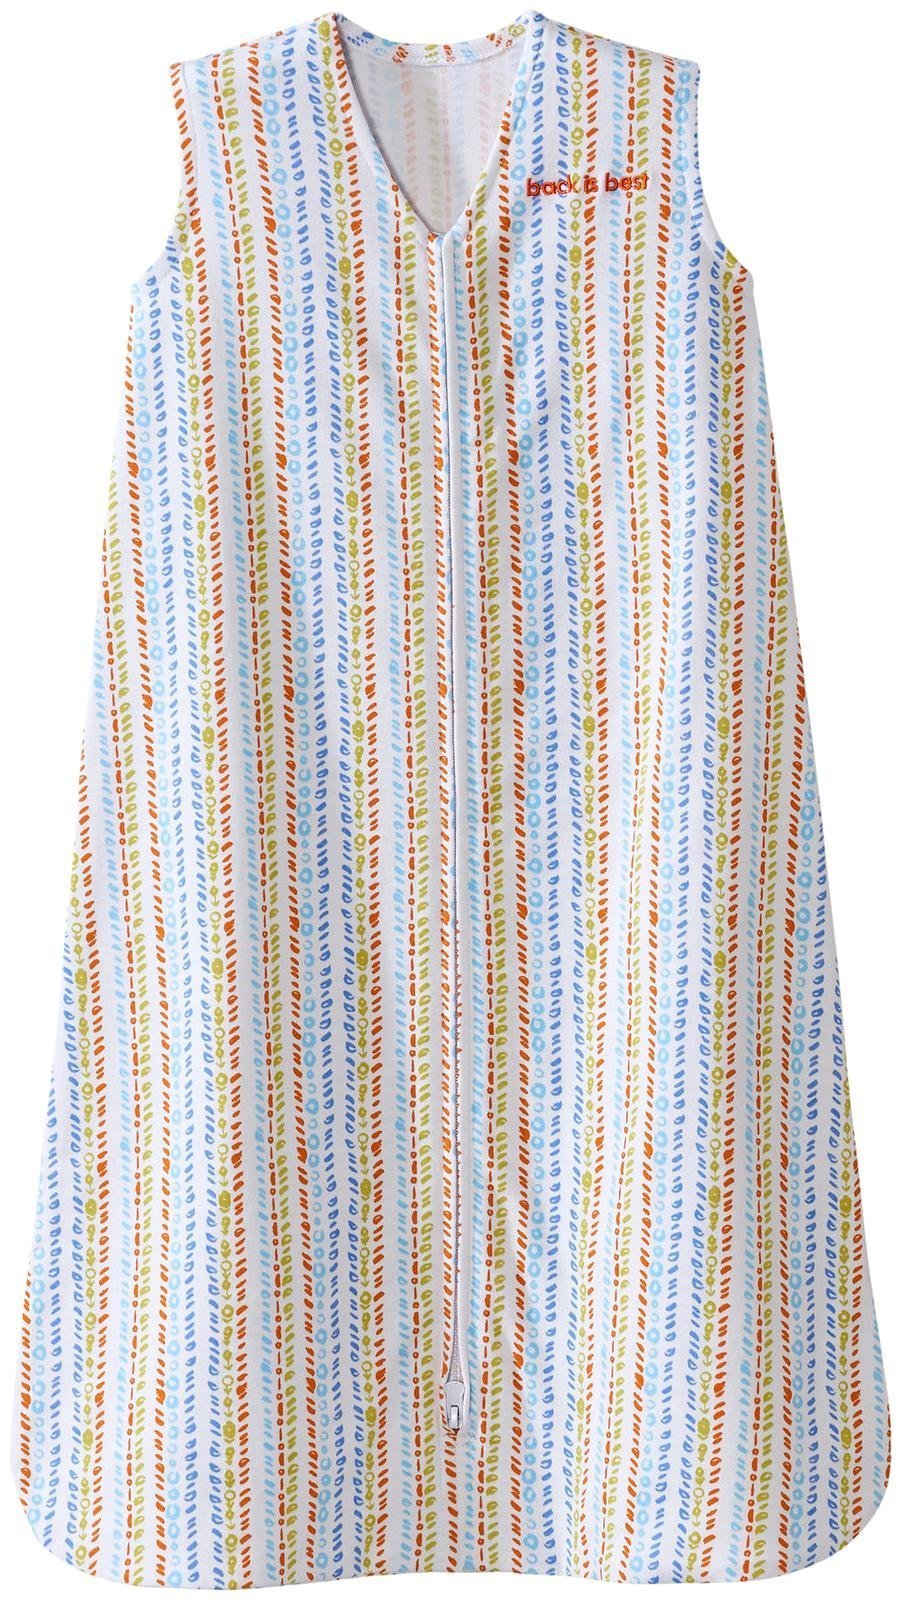 Halo SleepSack, 100% Cotton, Seaglass Fresh, Multi, Medium